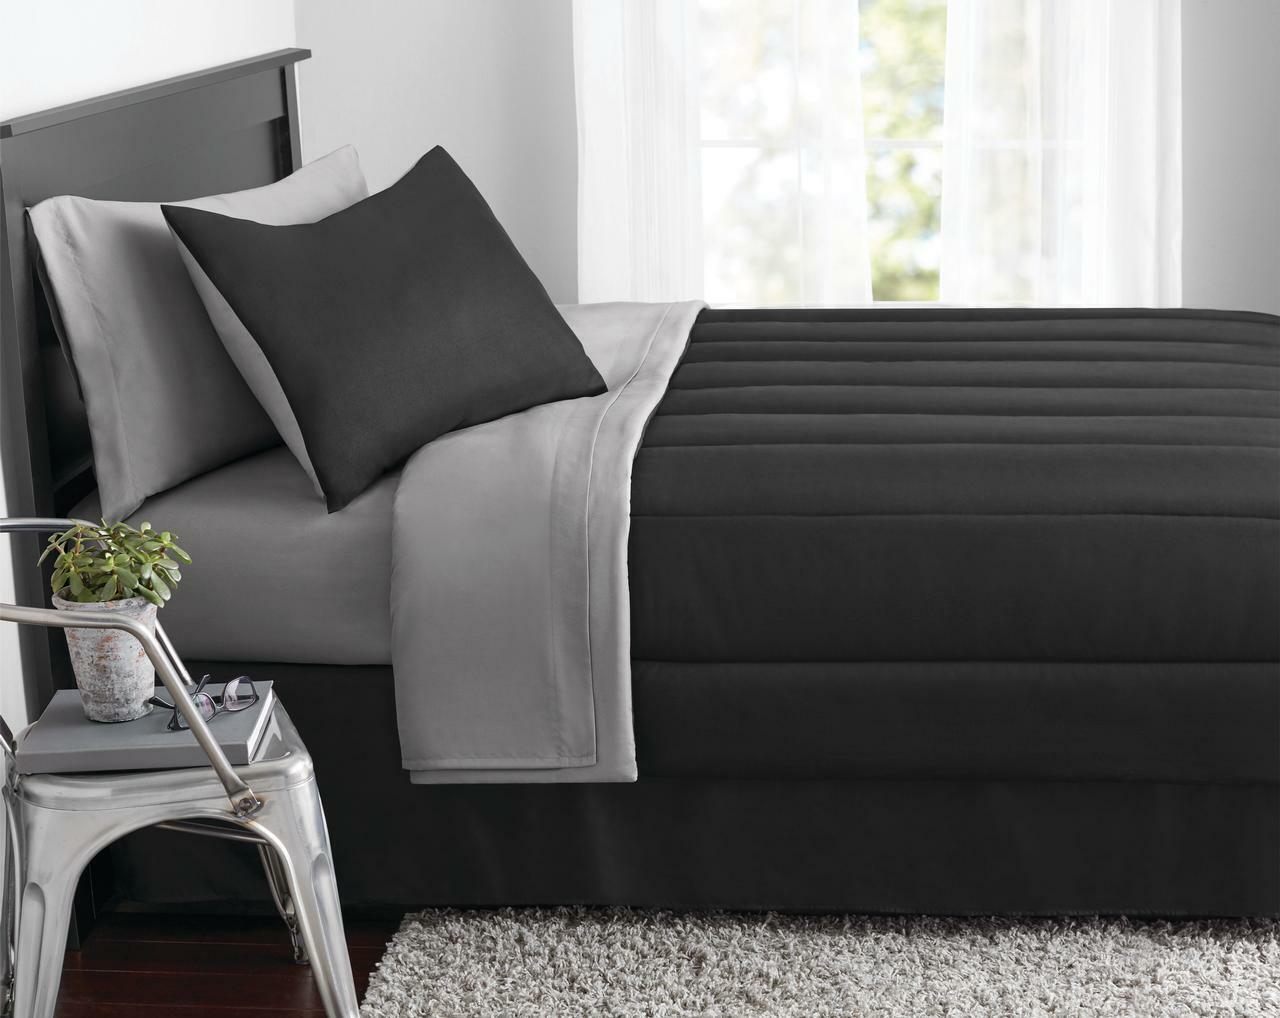 New 8 Piece Black Gray Full Size Comforter Set Bedspread Bed